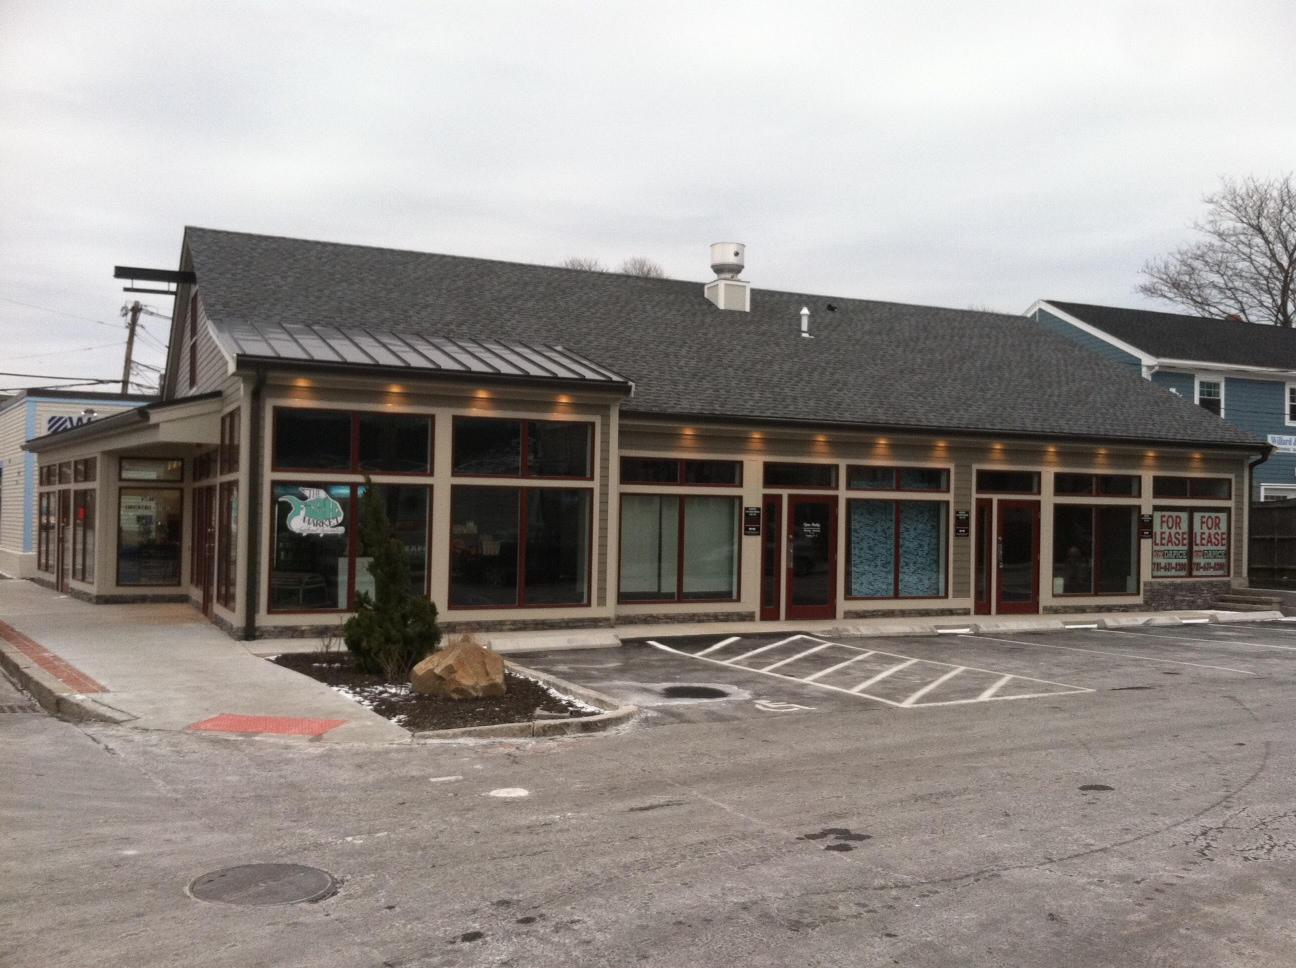 Marblehead, MA - Retail Plaza